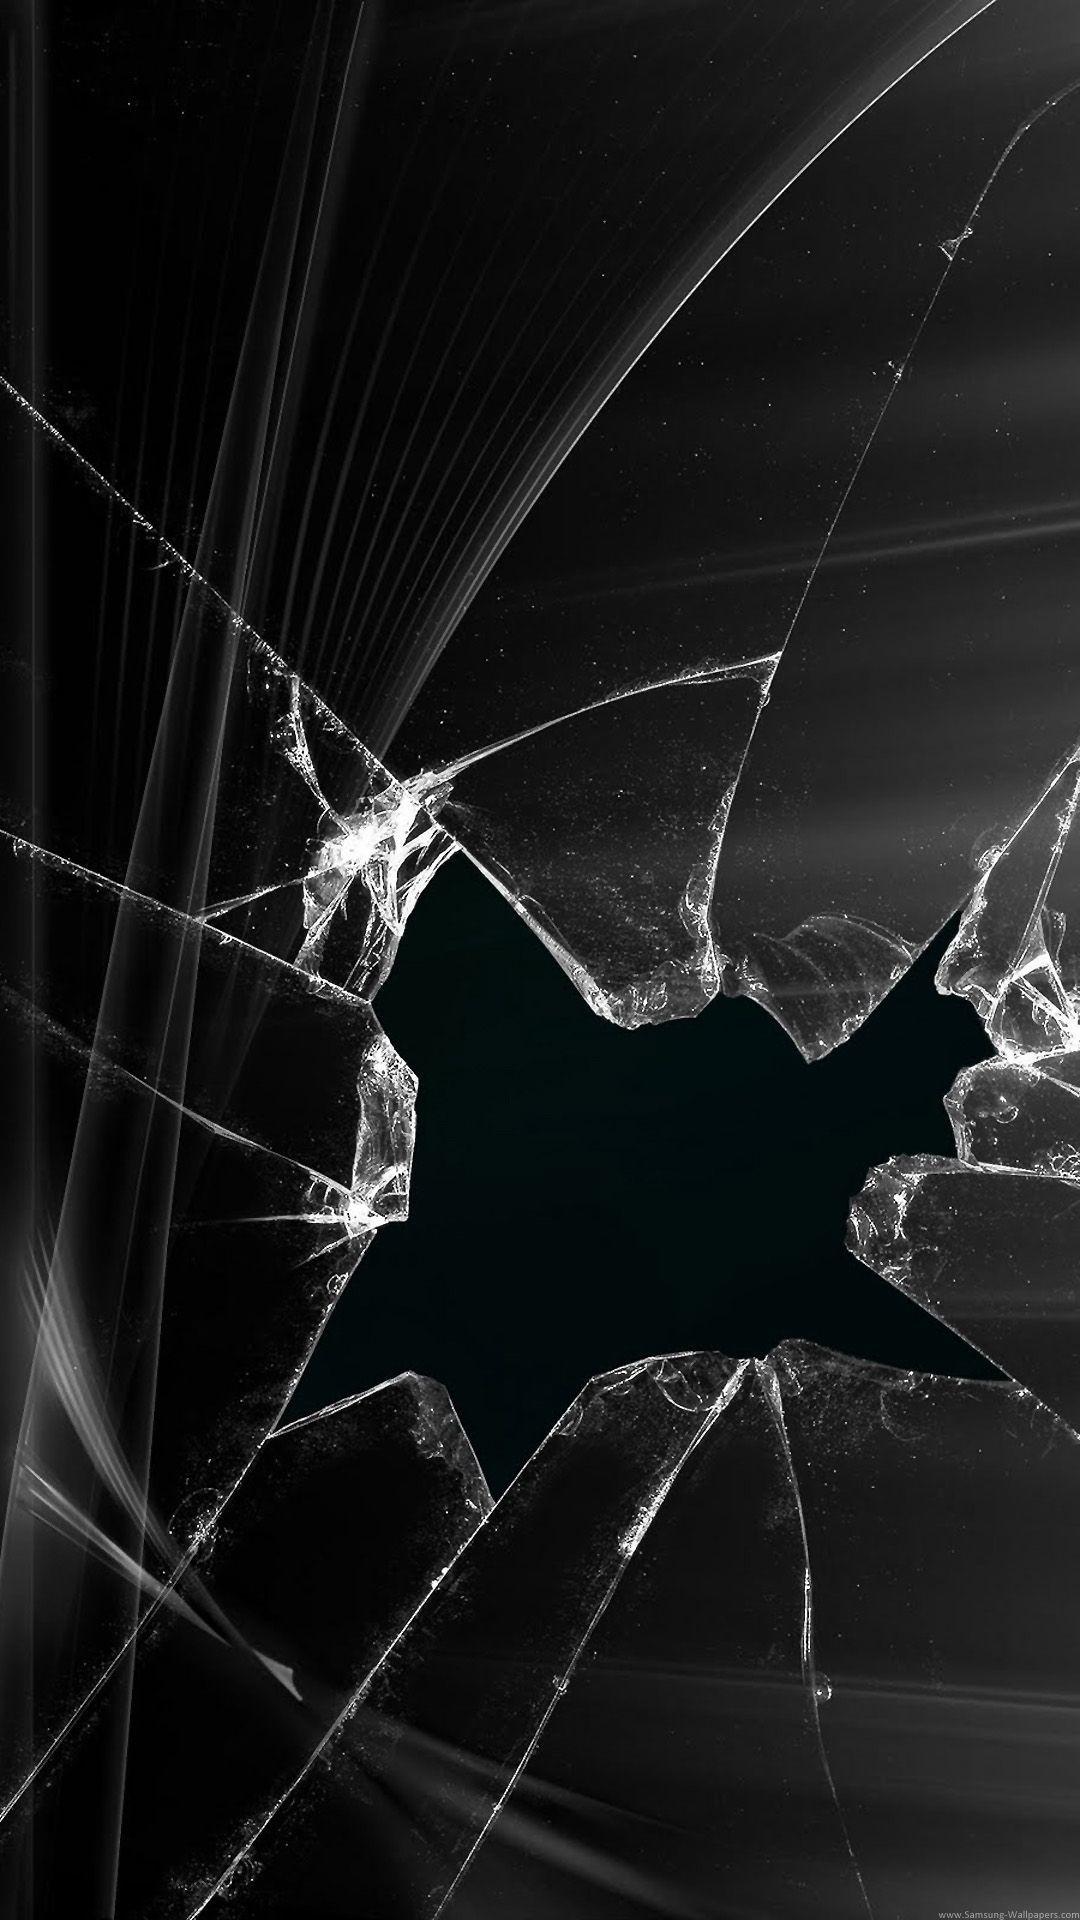 Res: 1080x1920, broken-screen-wallpaper-black-abstract-picture-cracked-screen-wallpaper.jpg  (1080×1920)